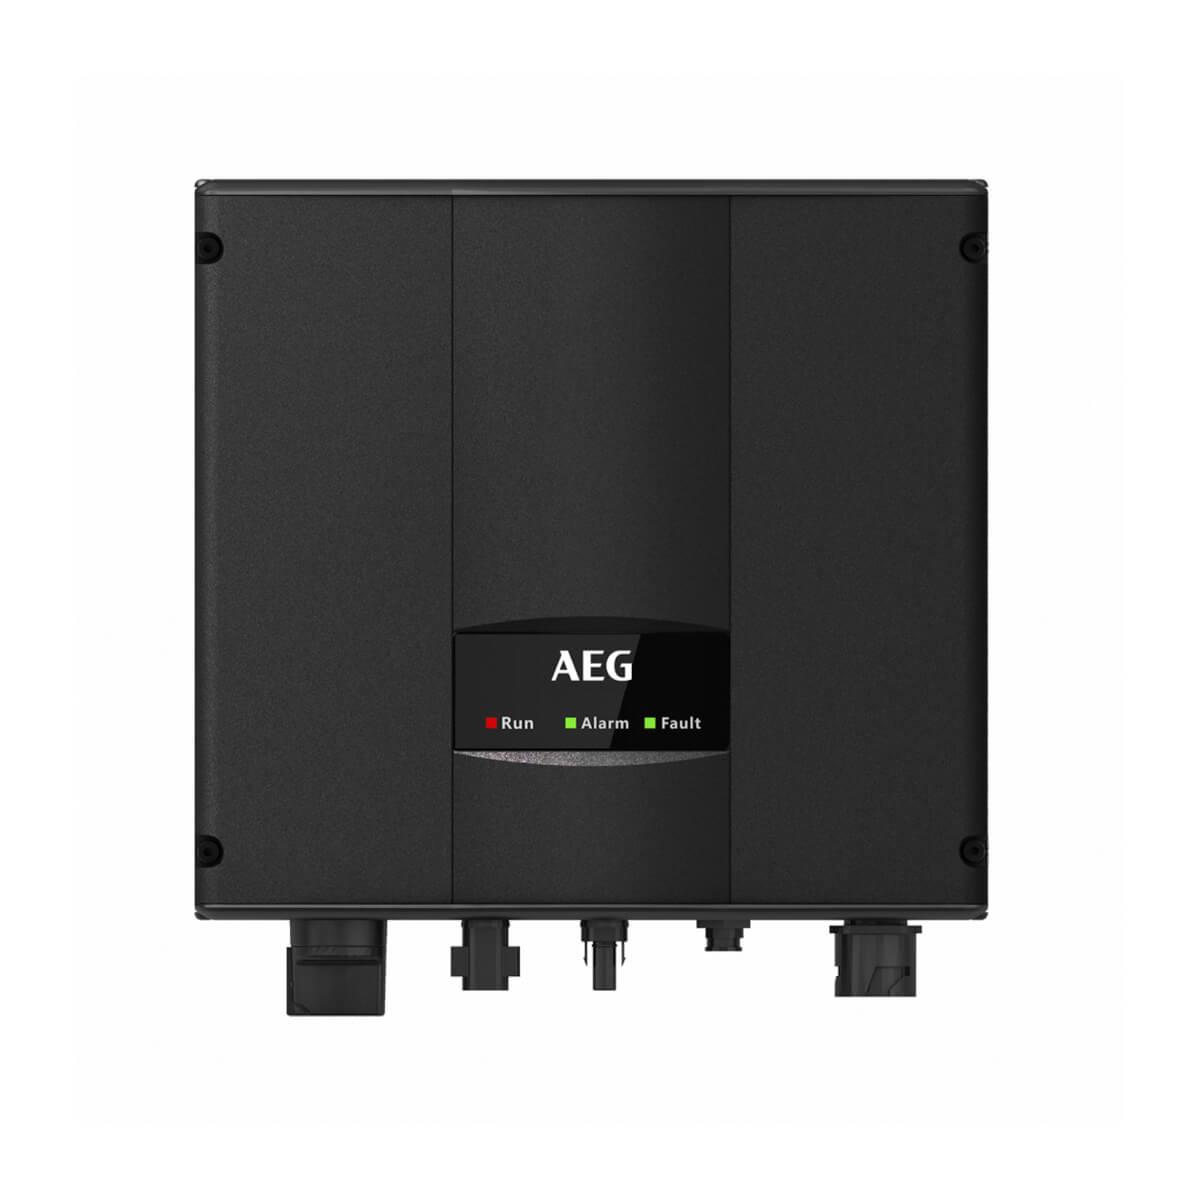 aeg 750W inverter, aeg as-ir01 750W inverter, aeg as-ir01-750 inverter, aeg as-ir01-750, aeg as-ir01 750W